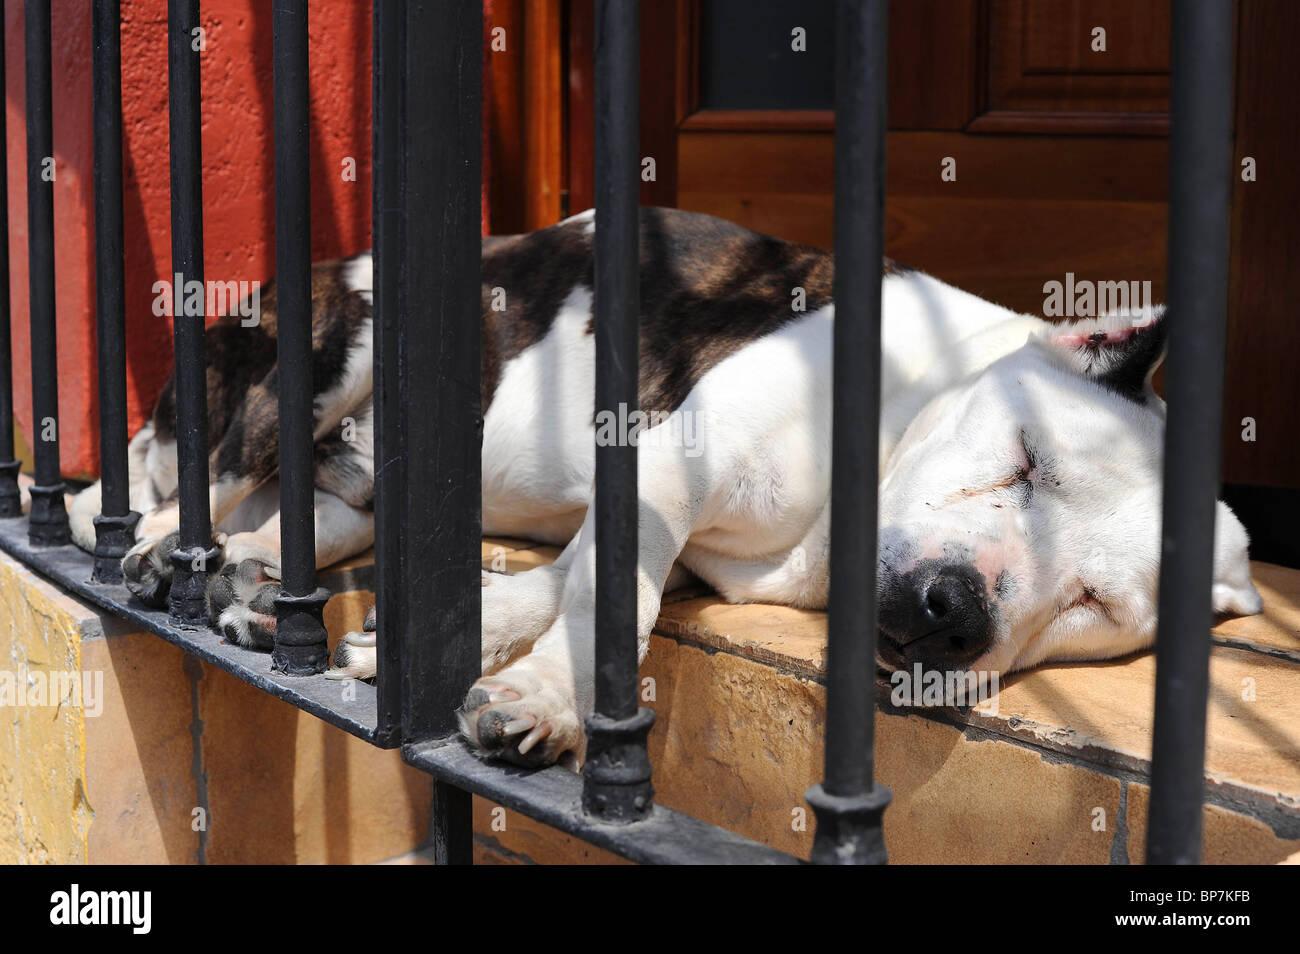 Dog fast asleep in the sun on open window ledge in house. Oaxaca, Mexico. - Stock Image